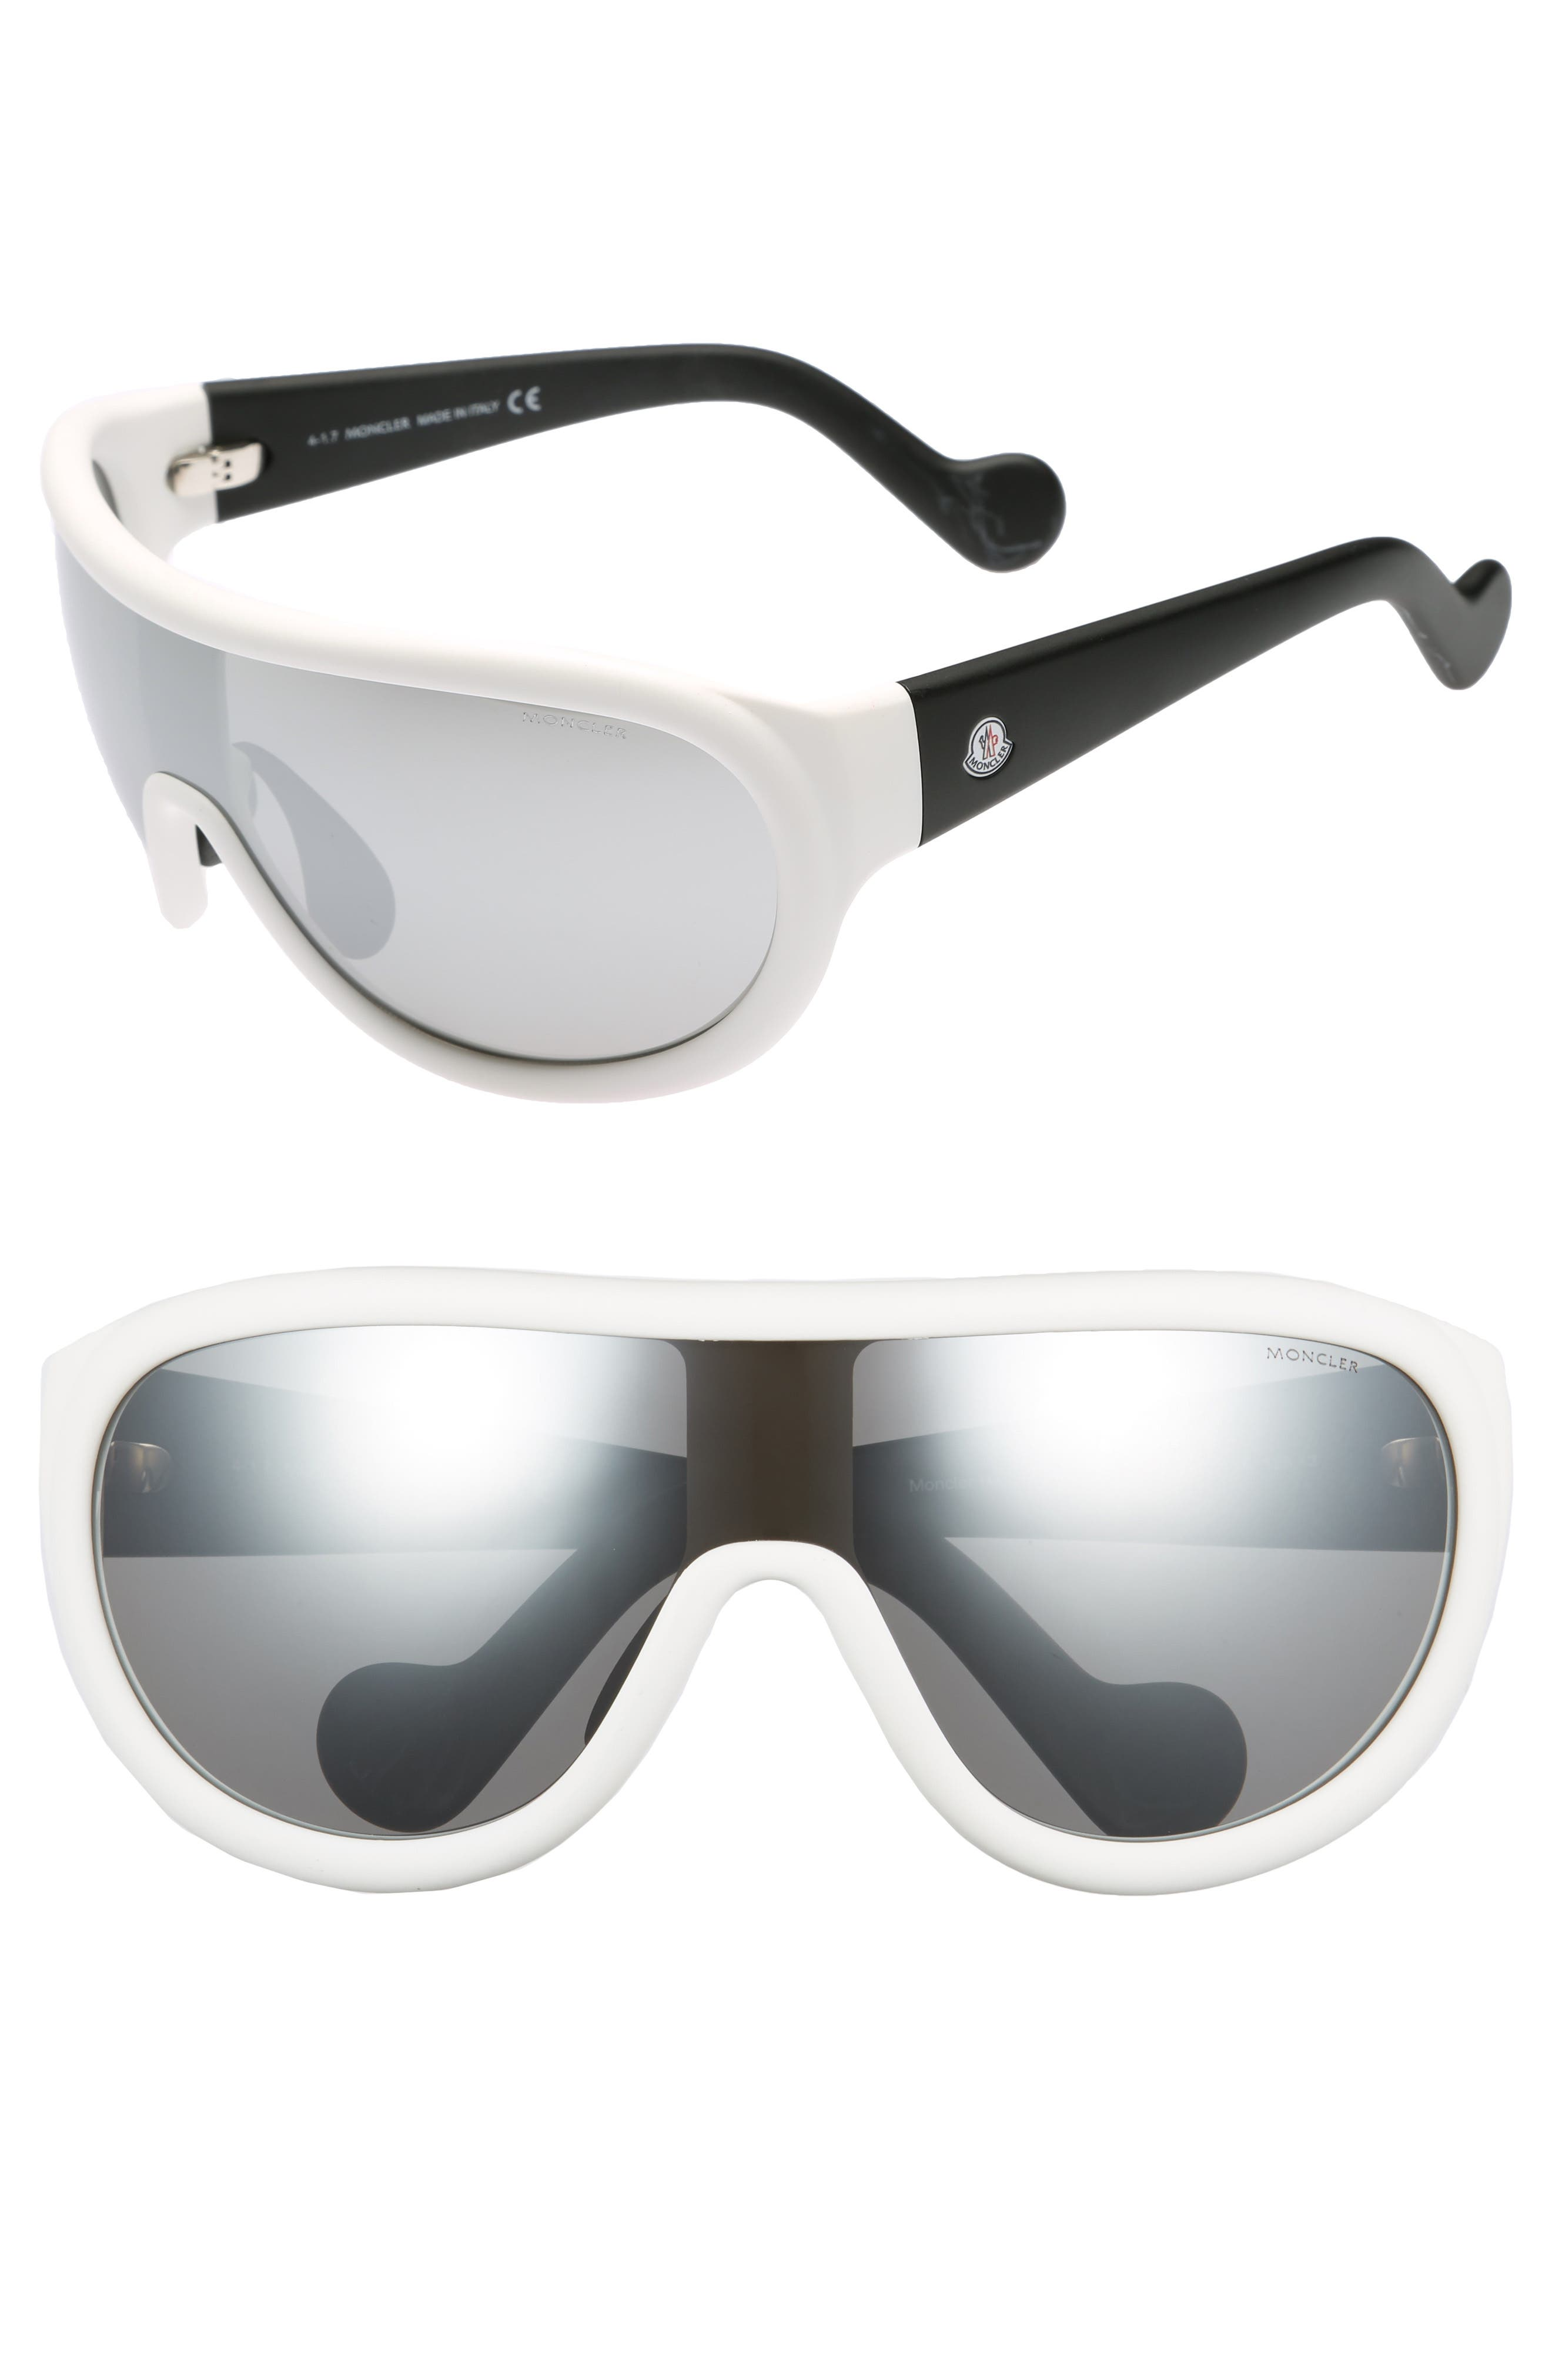 Main Image - Moncler Sport 60mm Aviator Sunglasses